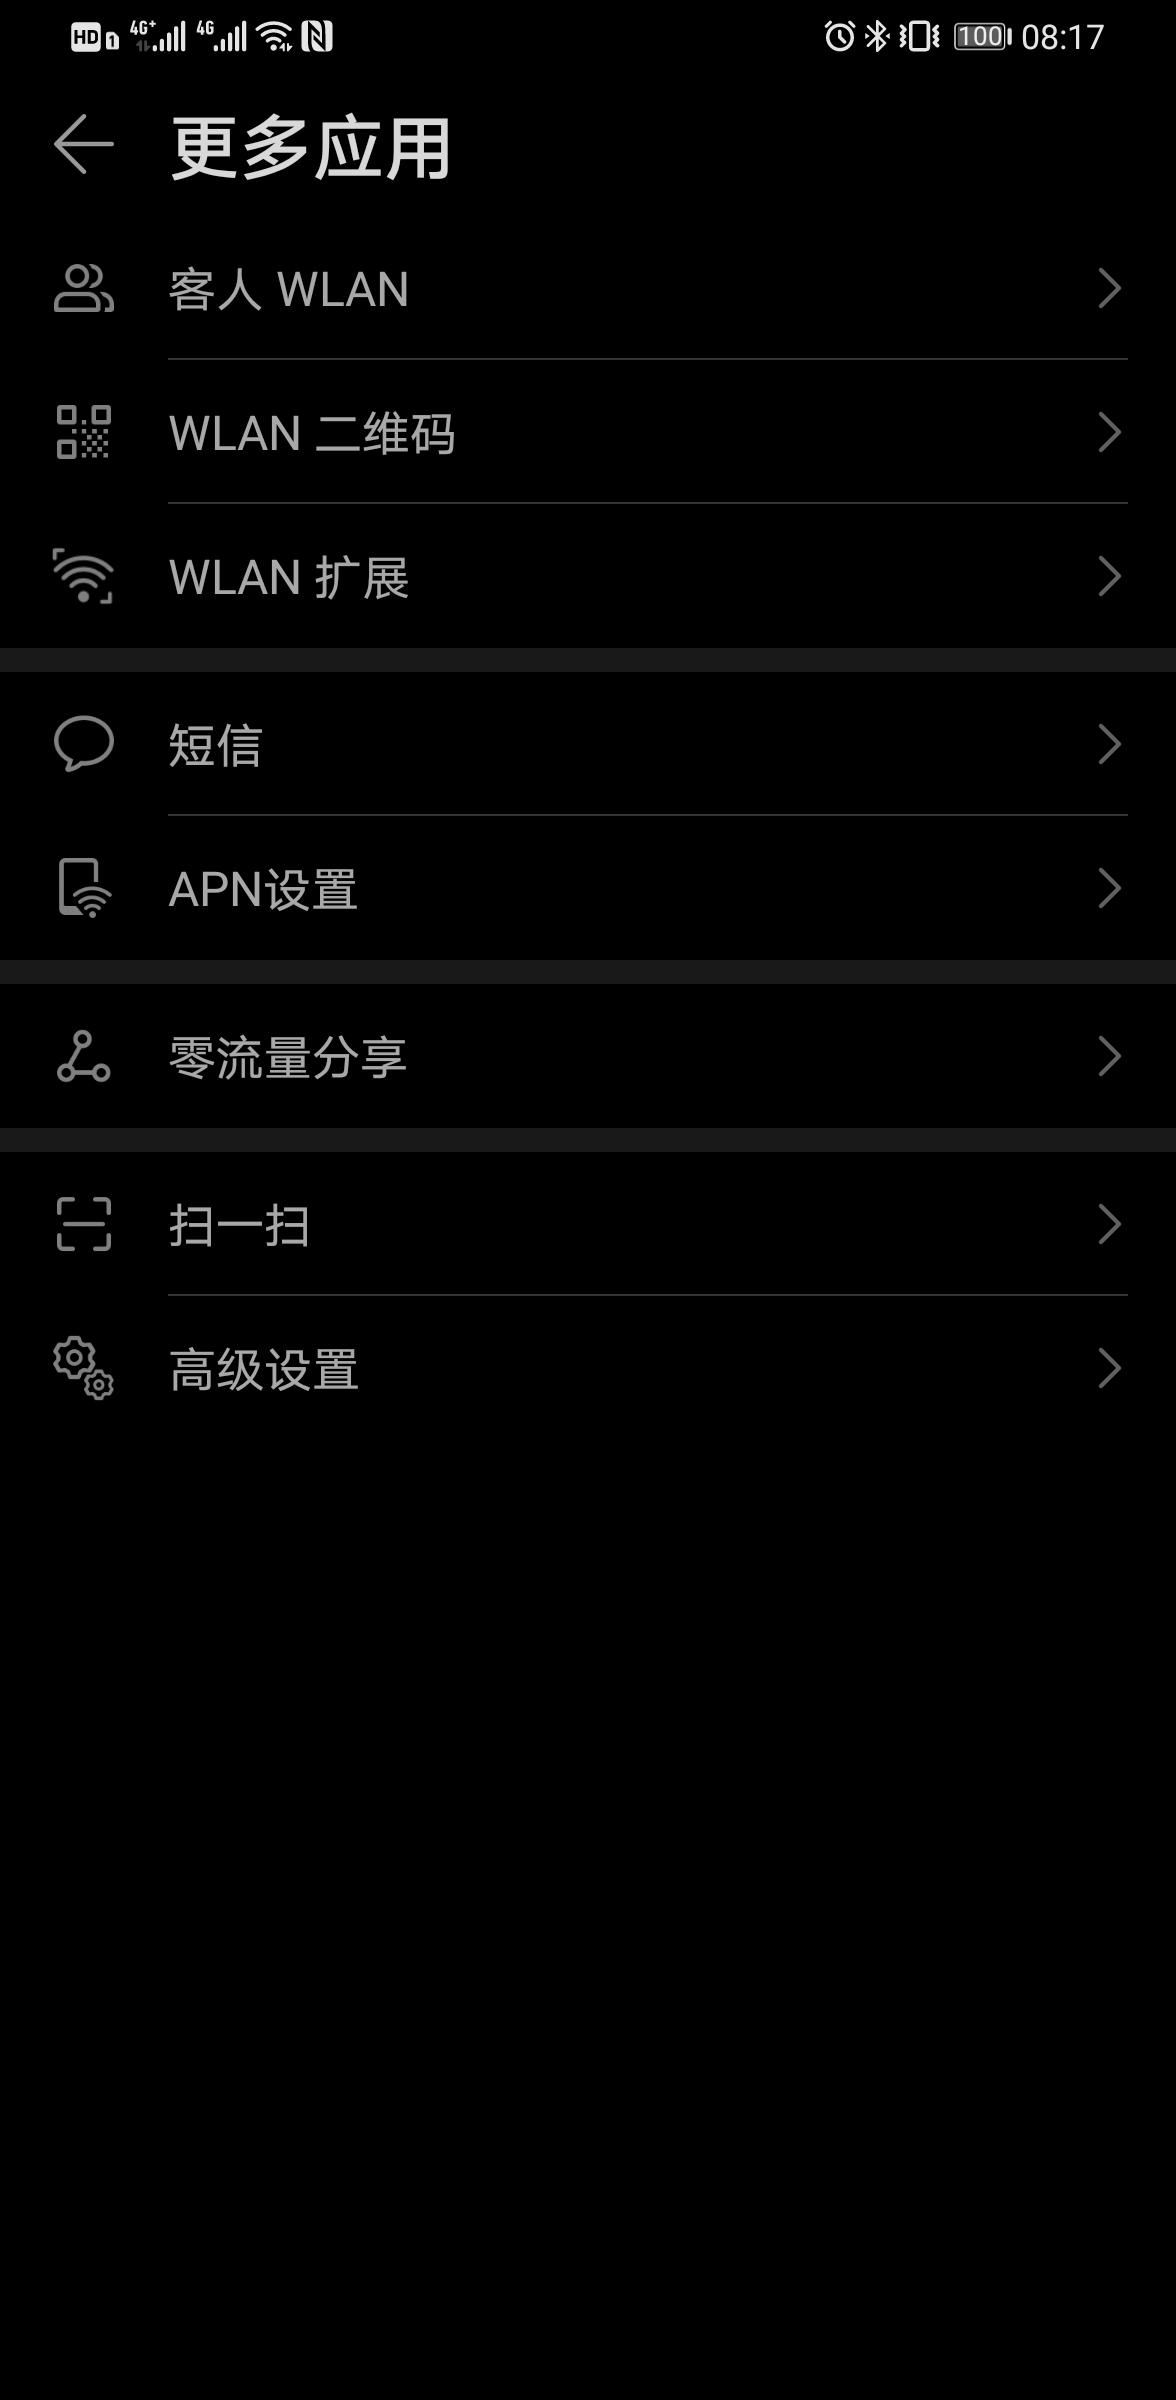 Screenshot_20200410_081708_com.huawei.smarthome.jpg